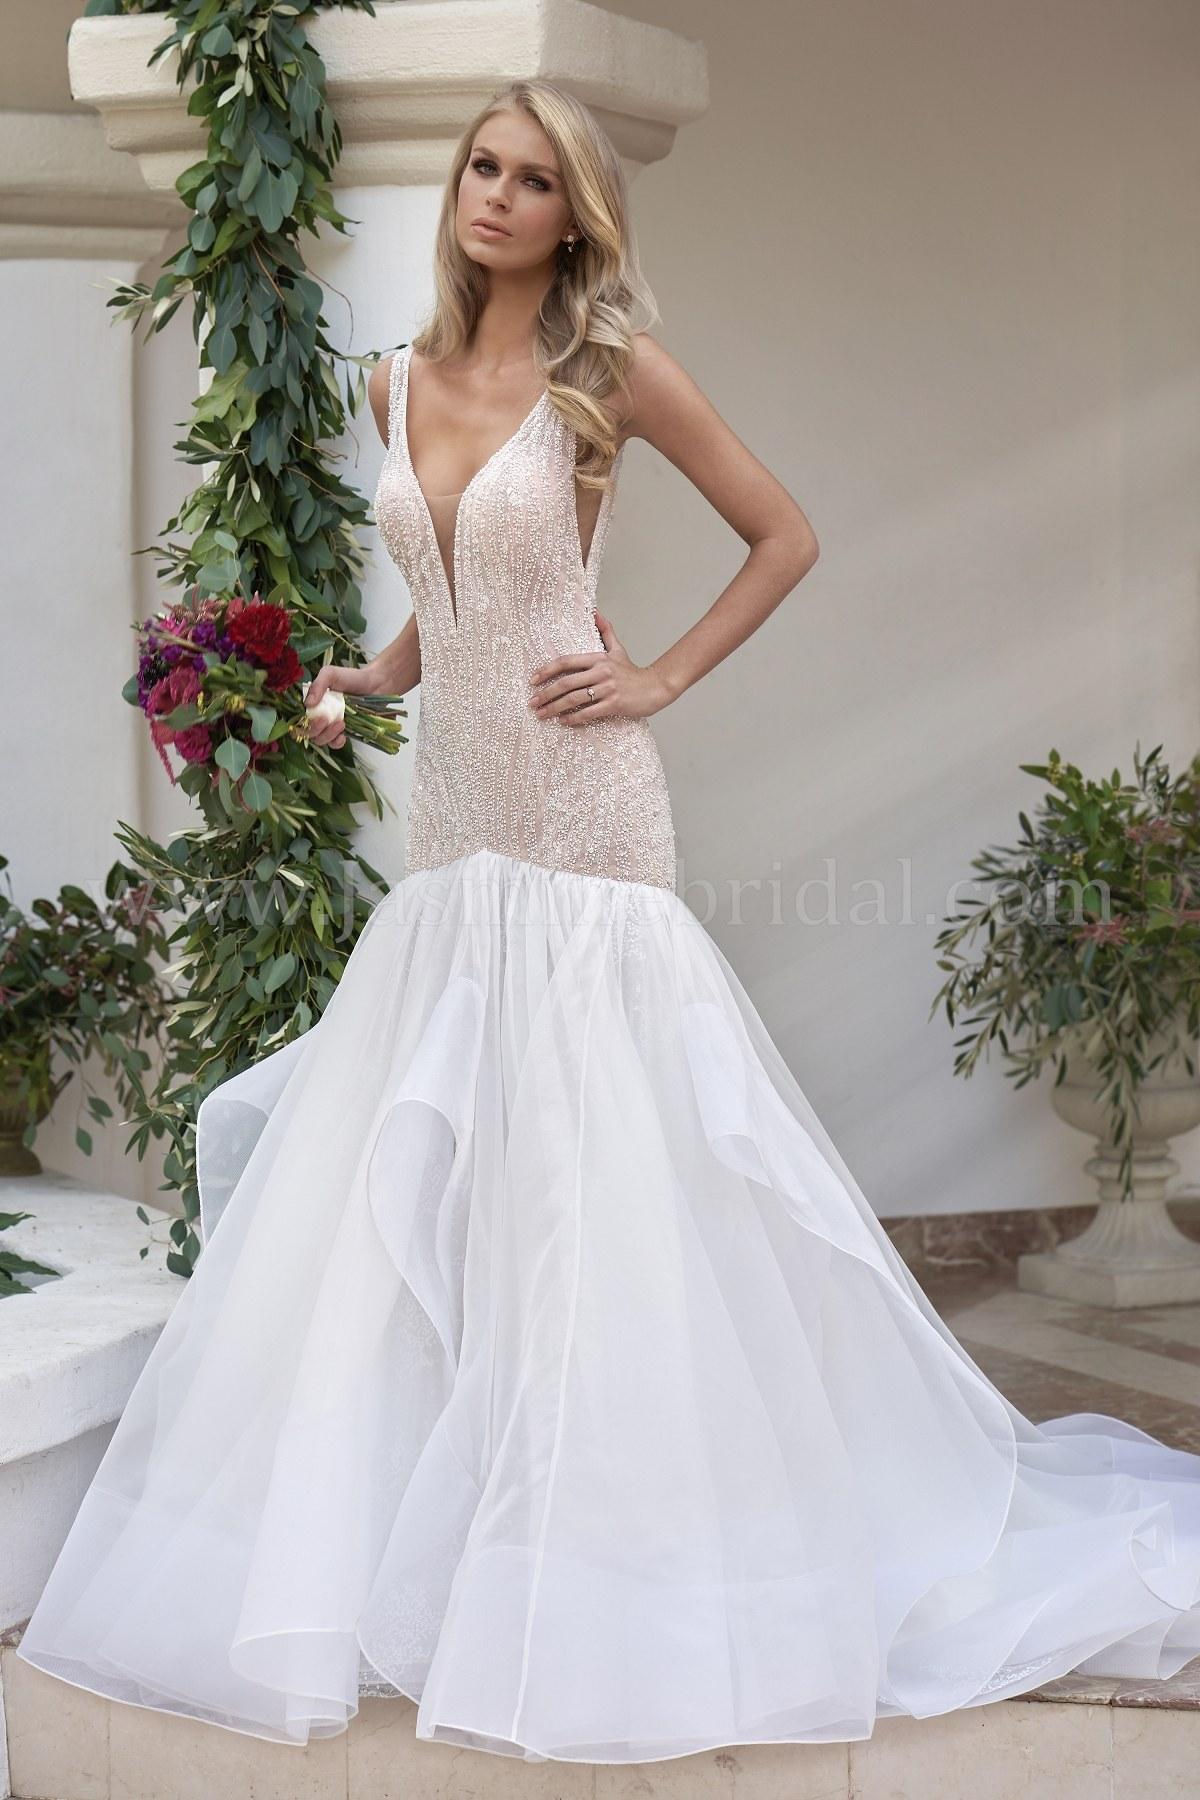 T202060 Illusion Bodice V Neck Sequin Lace Tulle Organza Wedding Dress